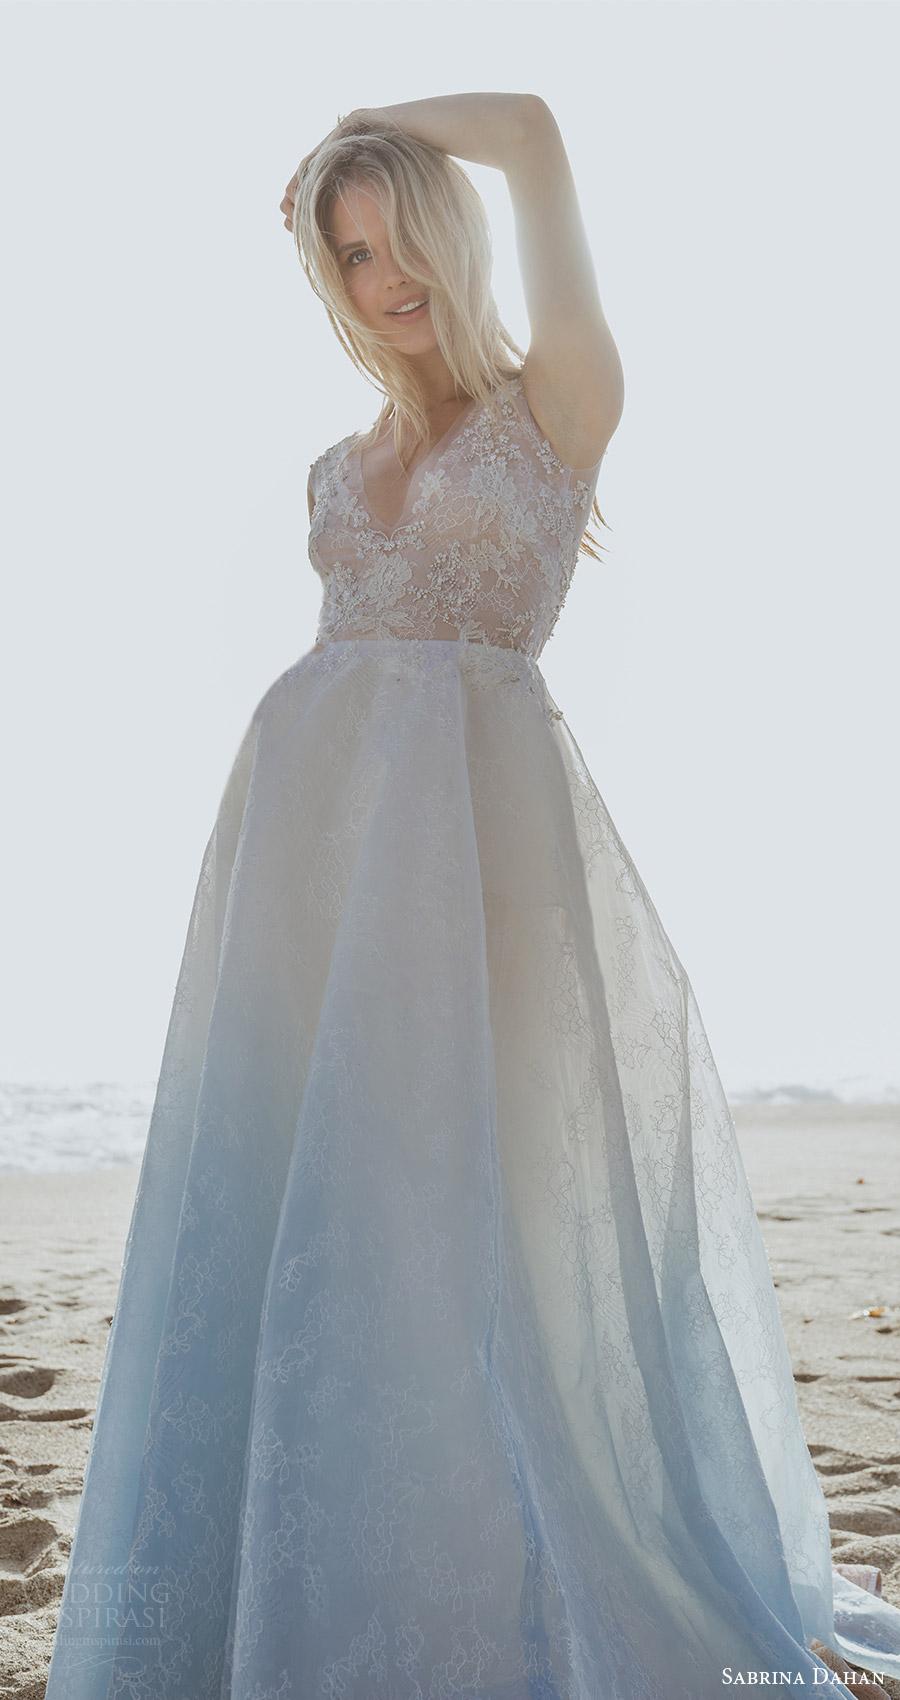 Beads, Lace, Ombre: Romantic Wedding Dresses